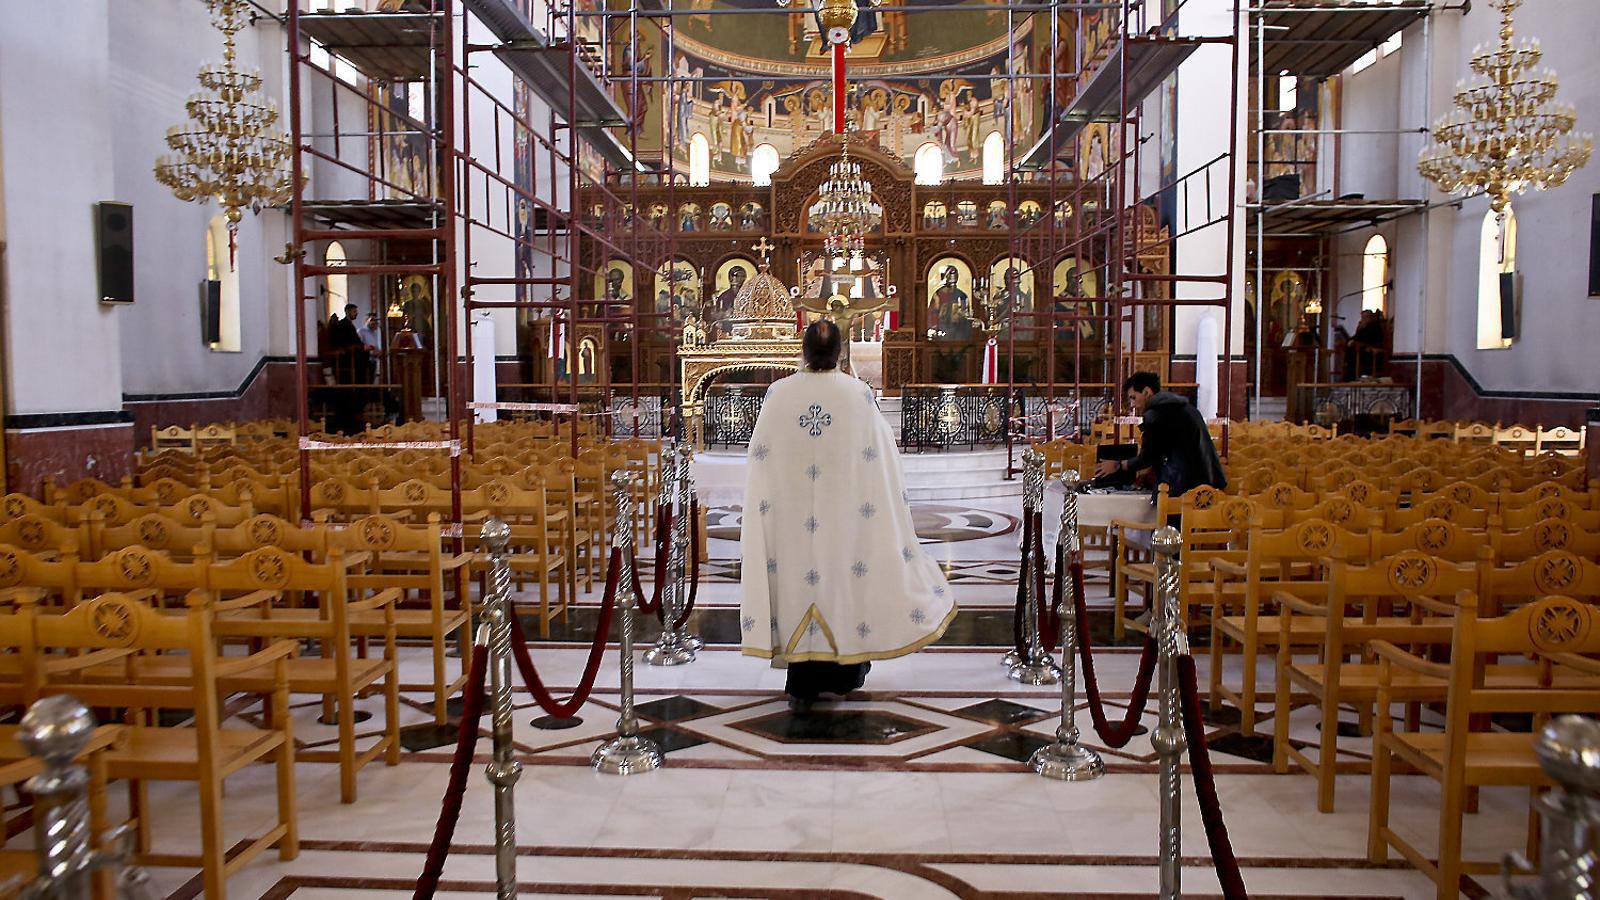 Una església ortodoxa d'Atenes buida per la pandèmia. / MILOS BICANSKI / GETTY